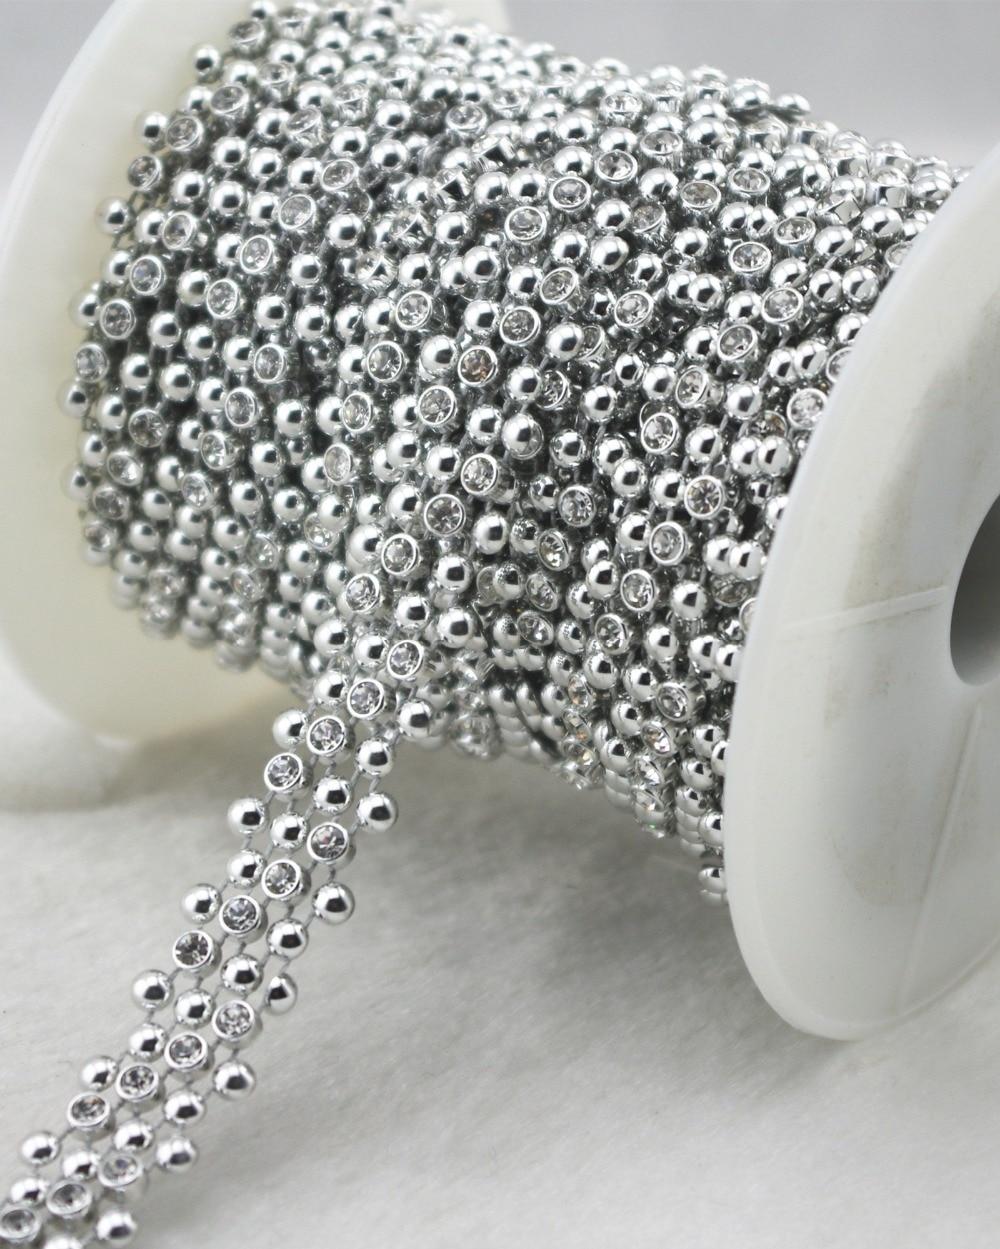 15mm Silver 6rows rhinestone Chain Sewing Costume Applique Cake Decoration  LZ163 10eb2bf6316c